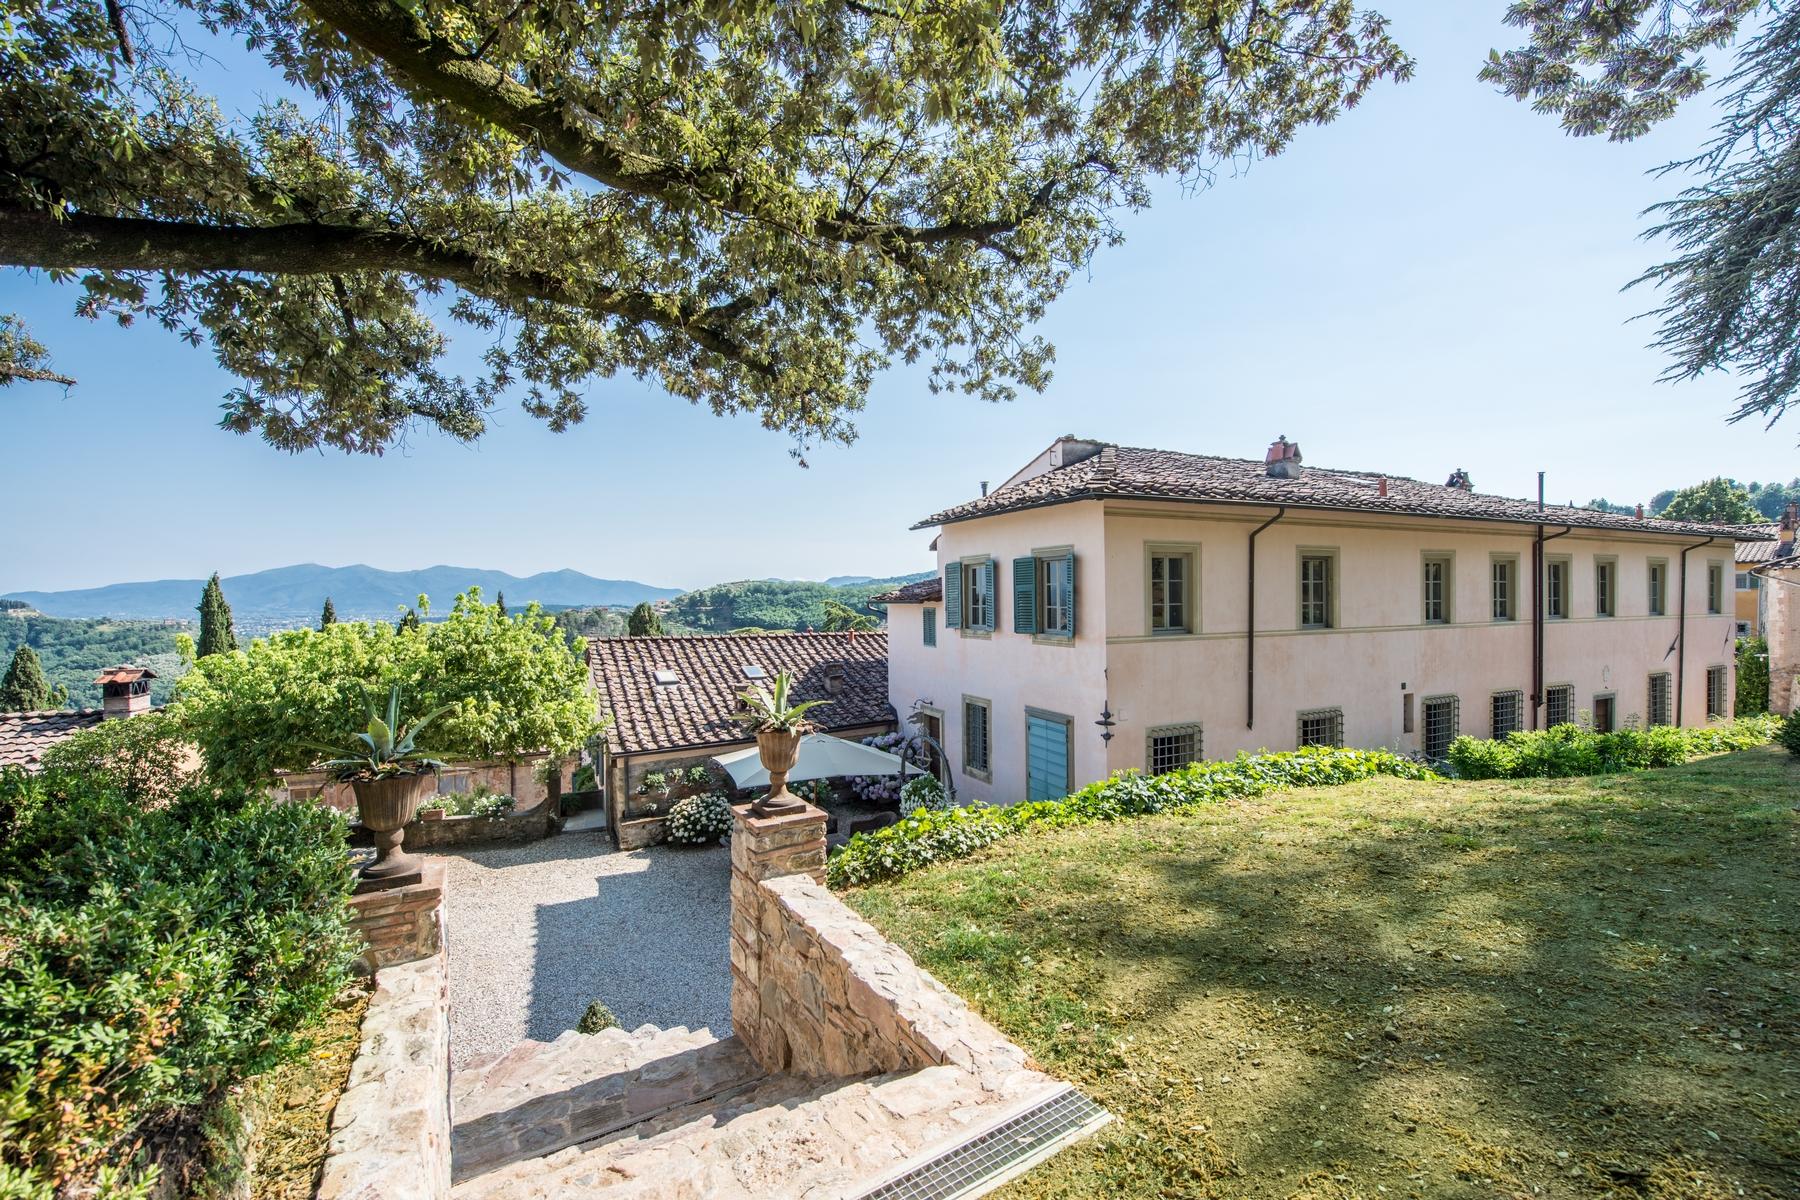 Villa in Vendita a Lucca: 5 locali, 2500 mq - Foto 16